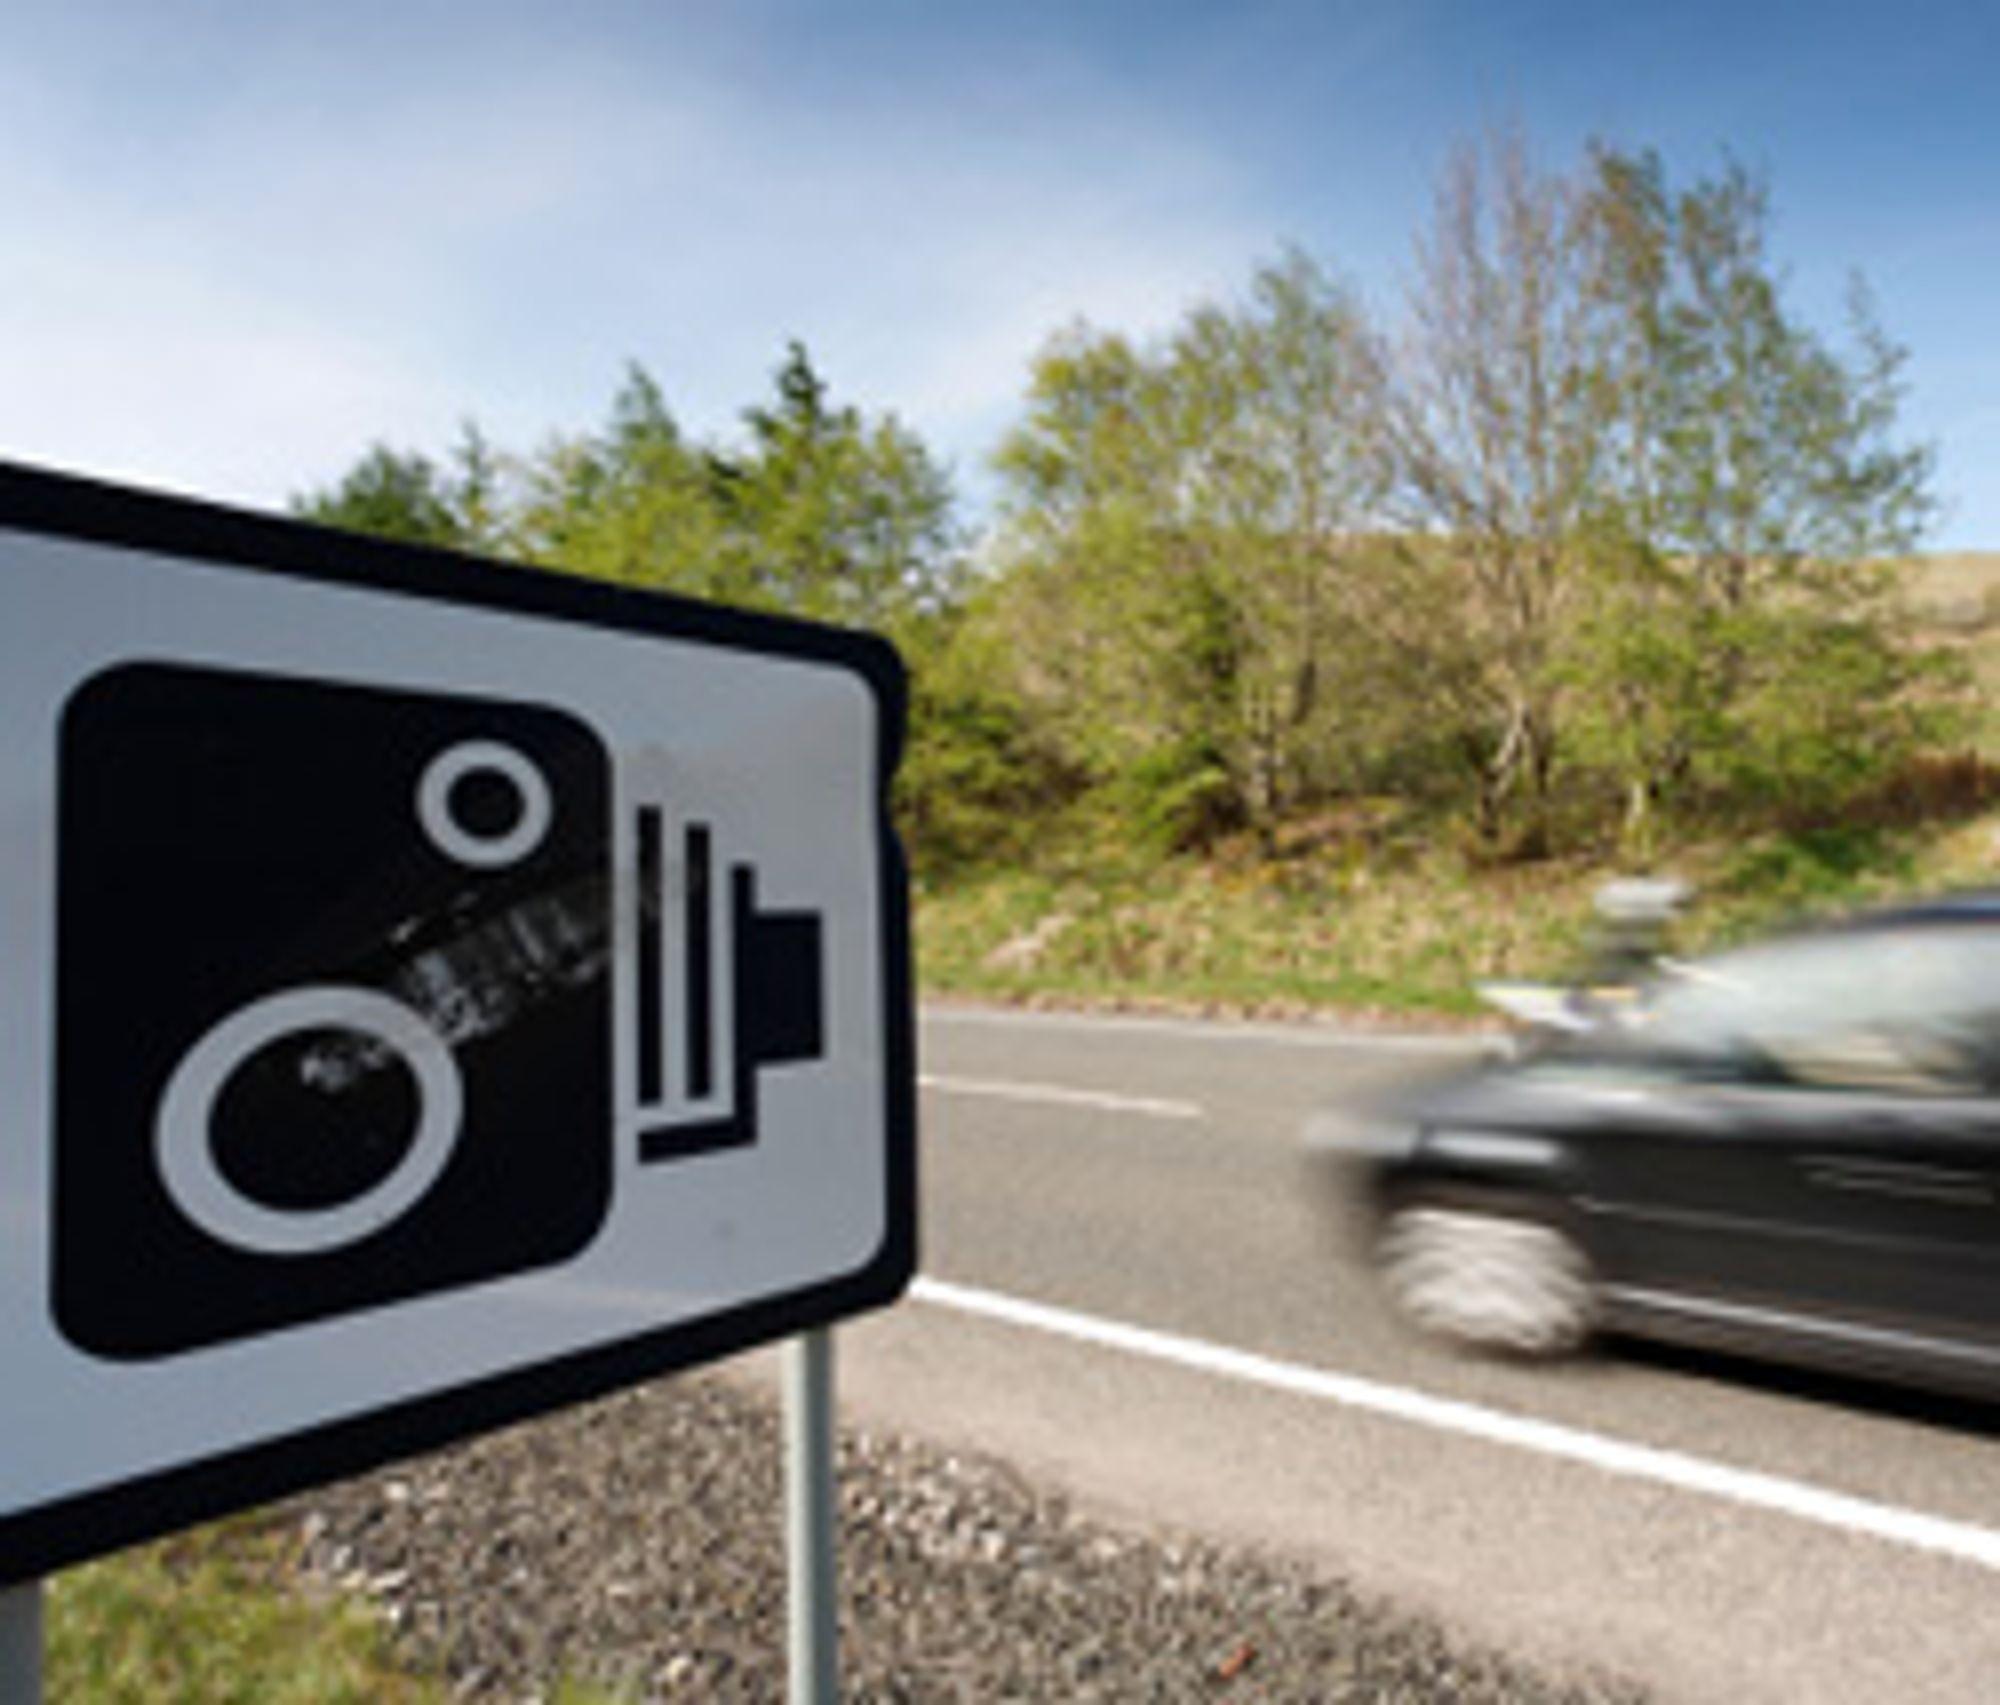 GPS-en kan varsle om fotobokser. (Foto: Istockphoto / David Chadwick)